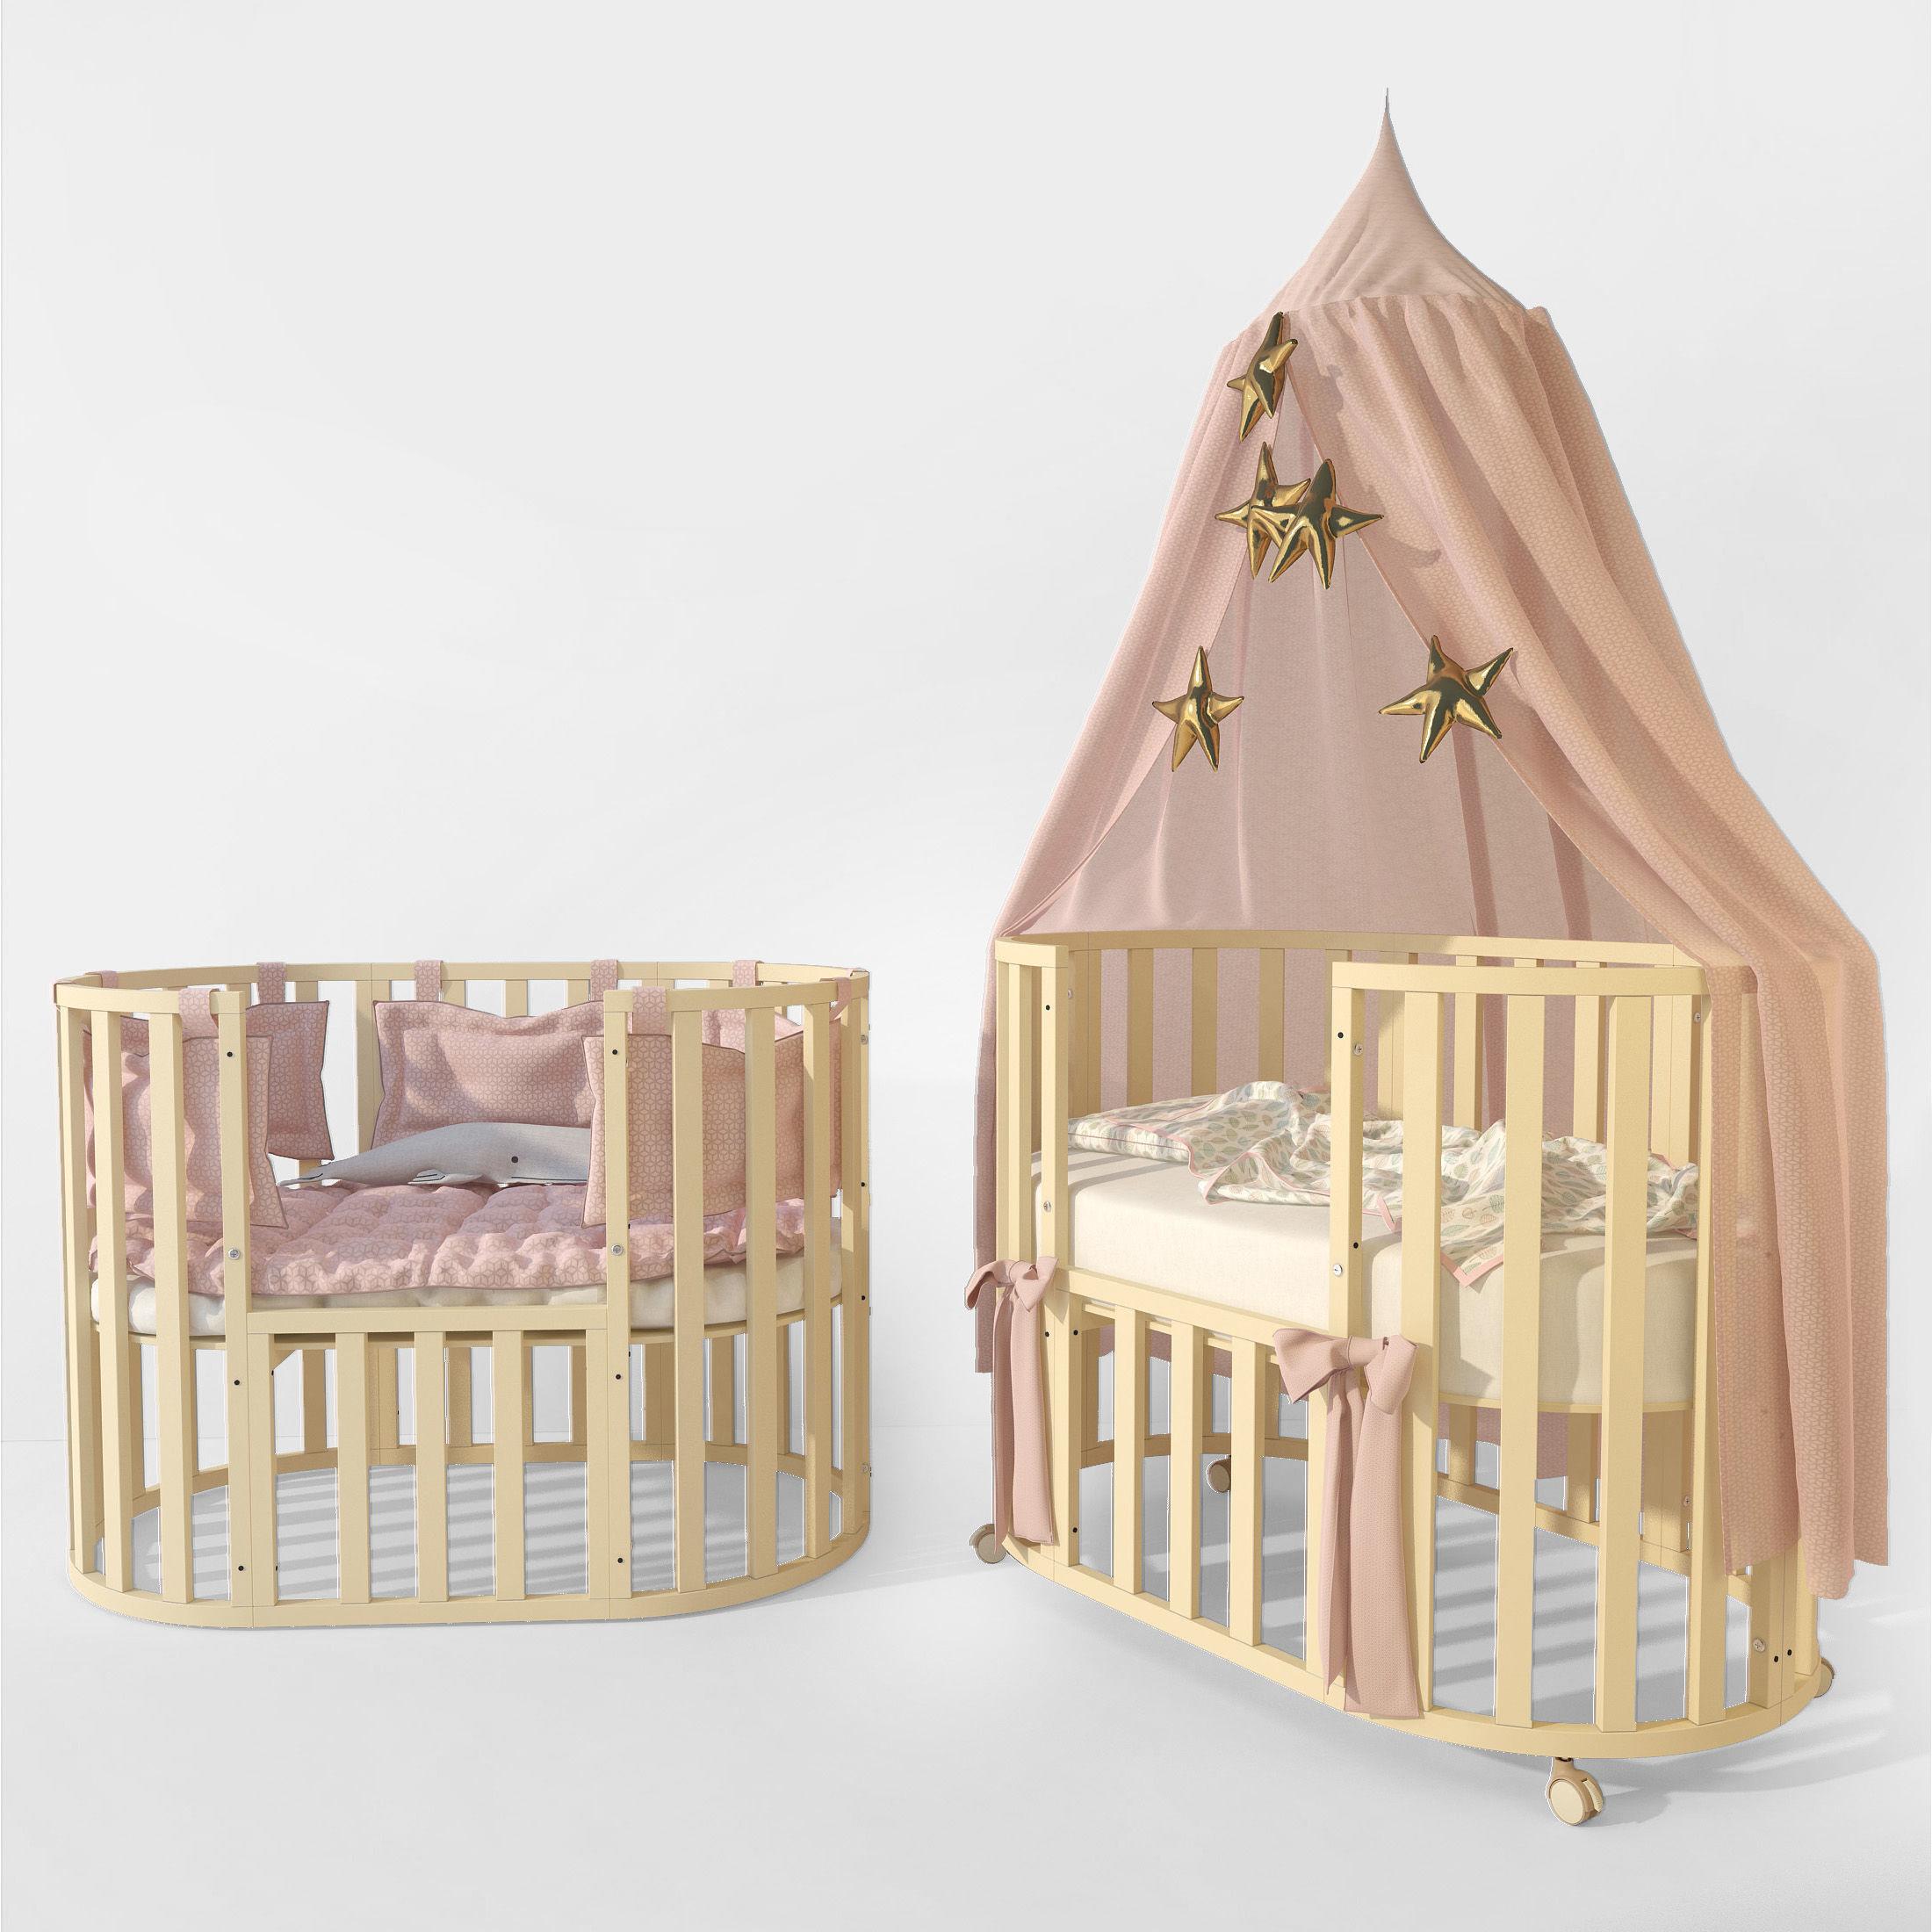 Oval crib Letto Bambini Elegante ivory